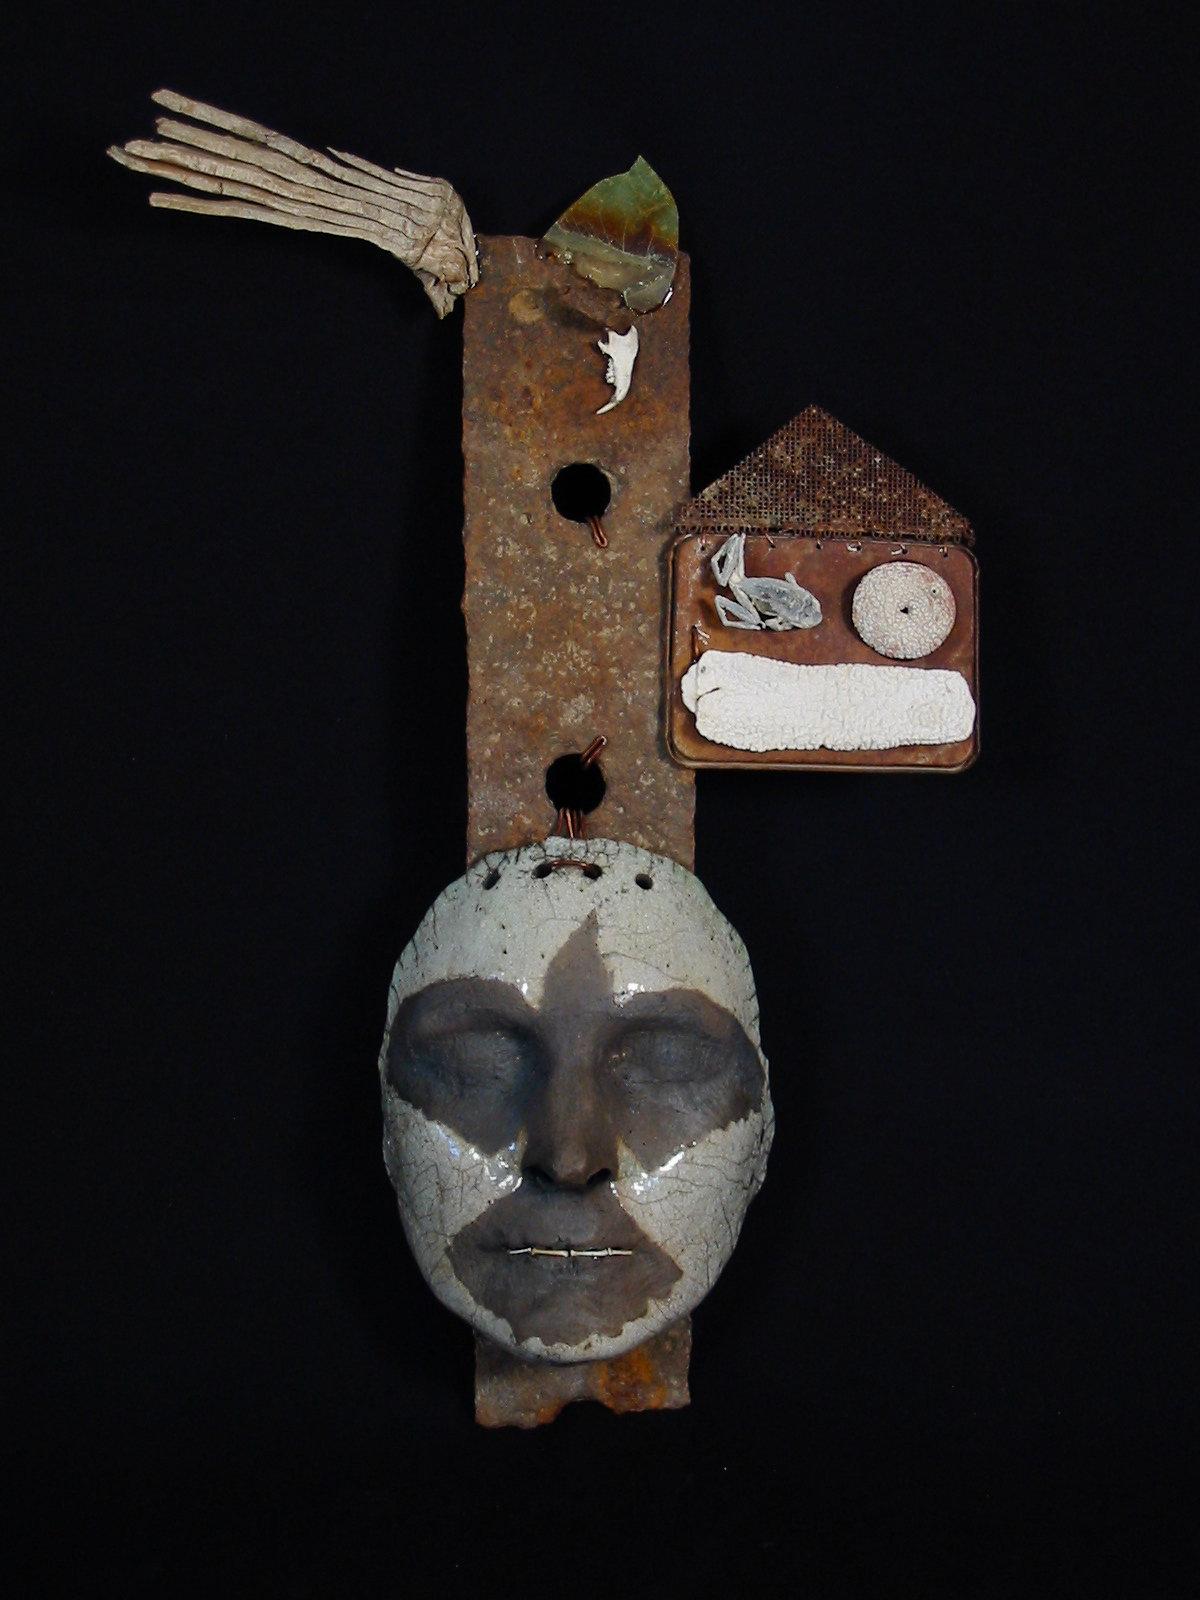 Three Day Mask Assemblage Workshop